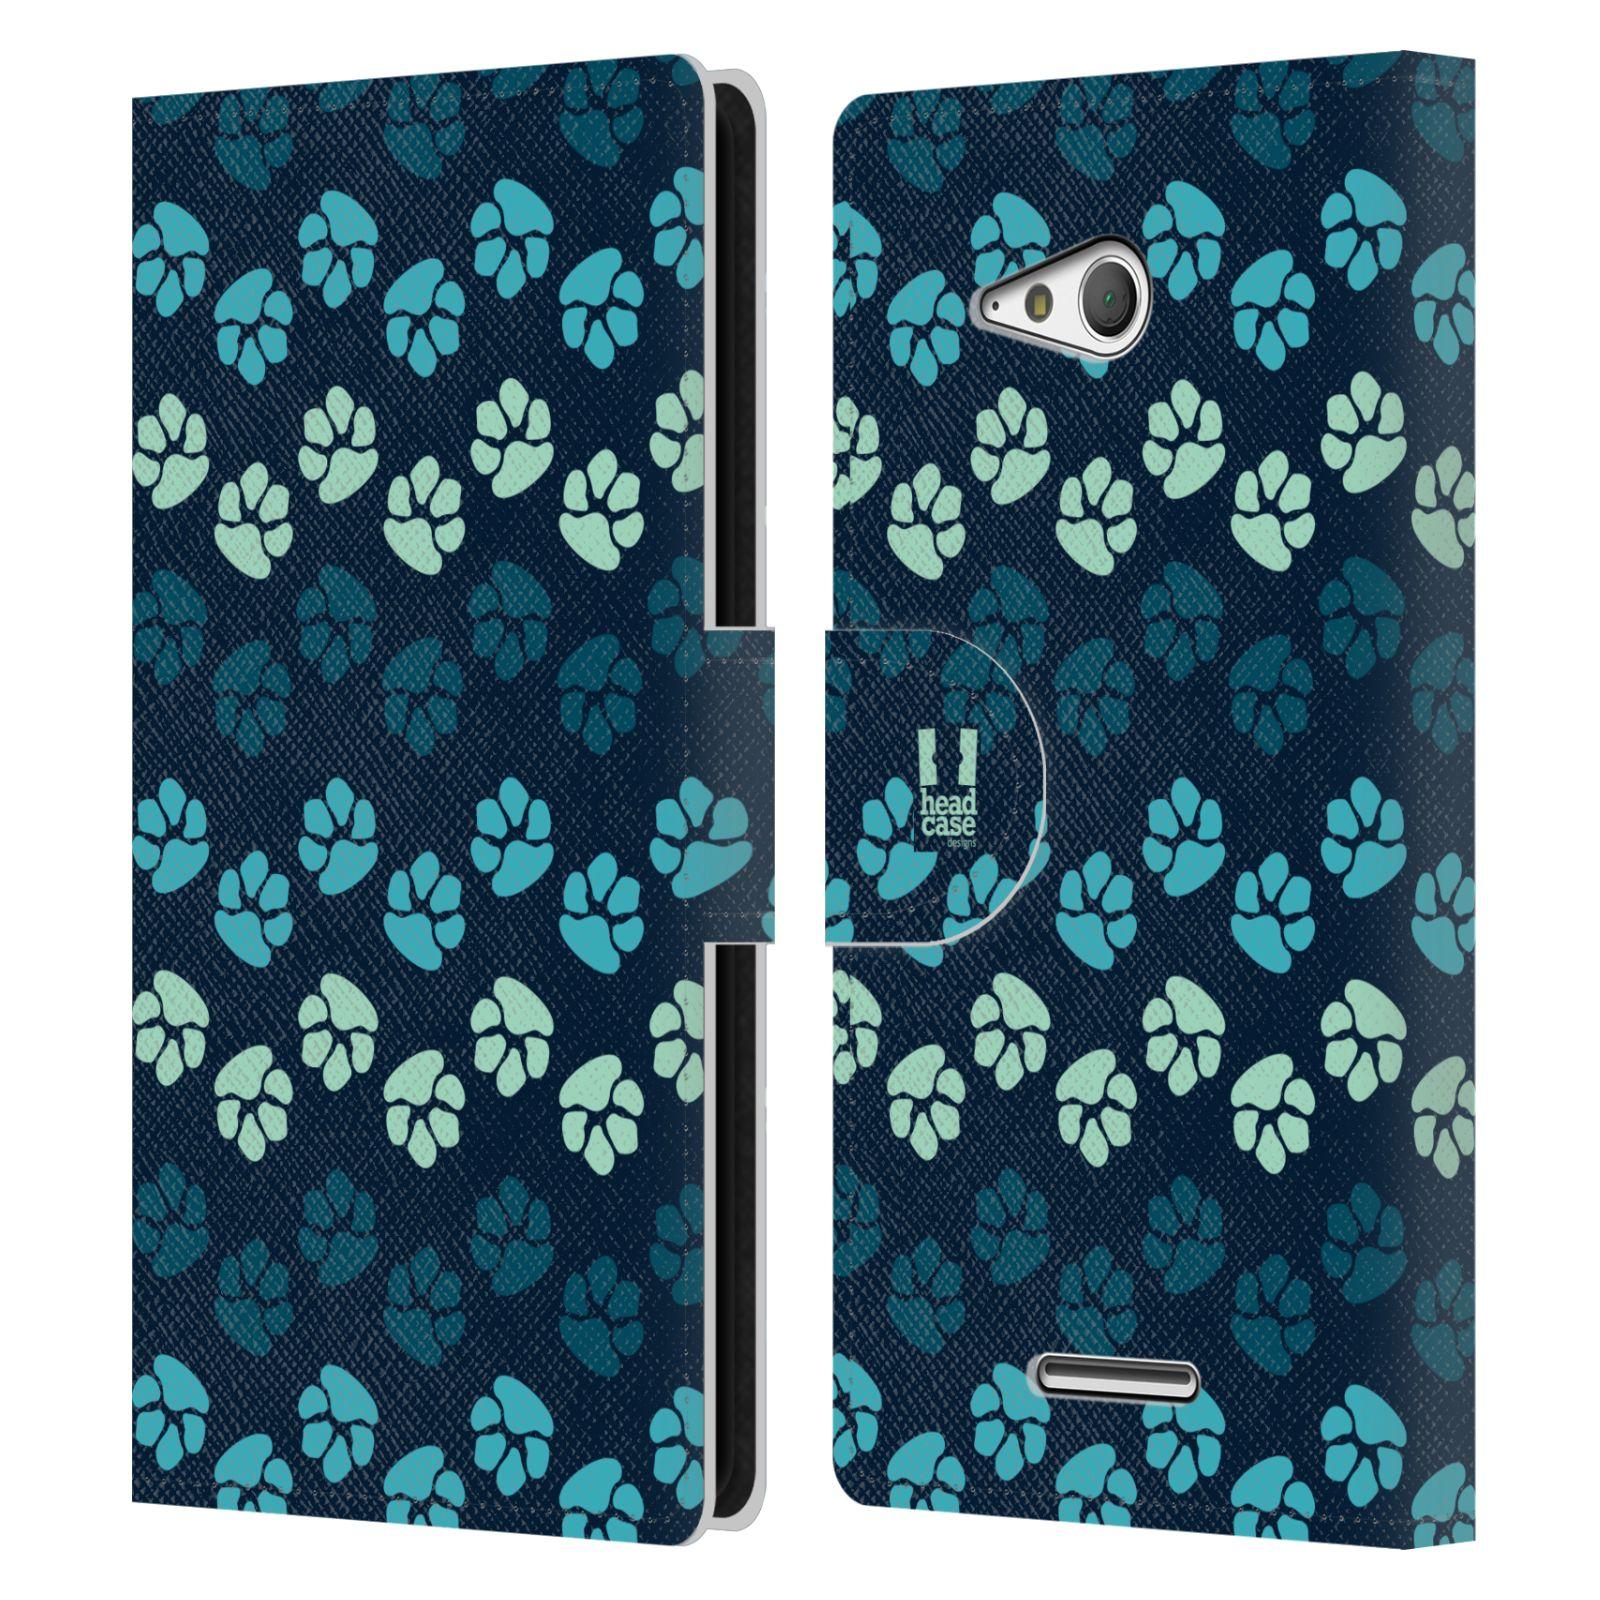 HEAD CASE Flipové pouzdro pro mobil SONY XPERIA E4g Pejsek ťapky modrá barva